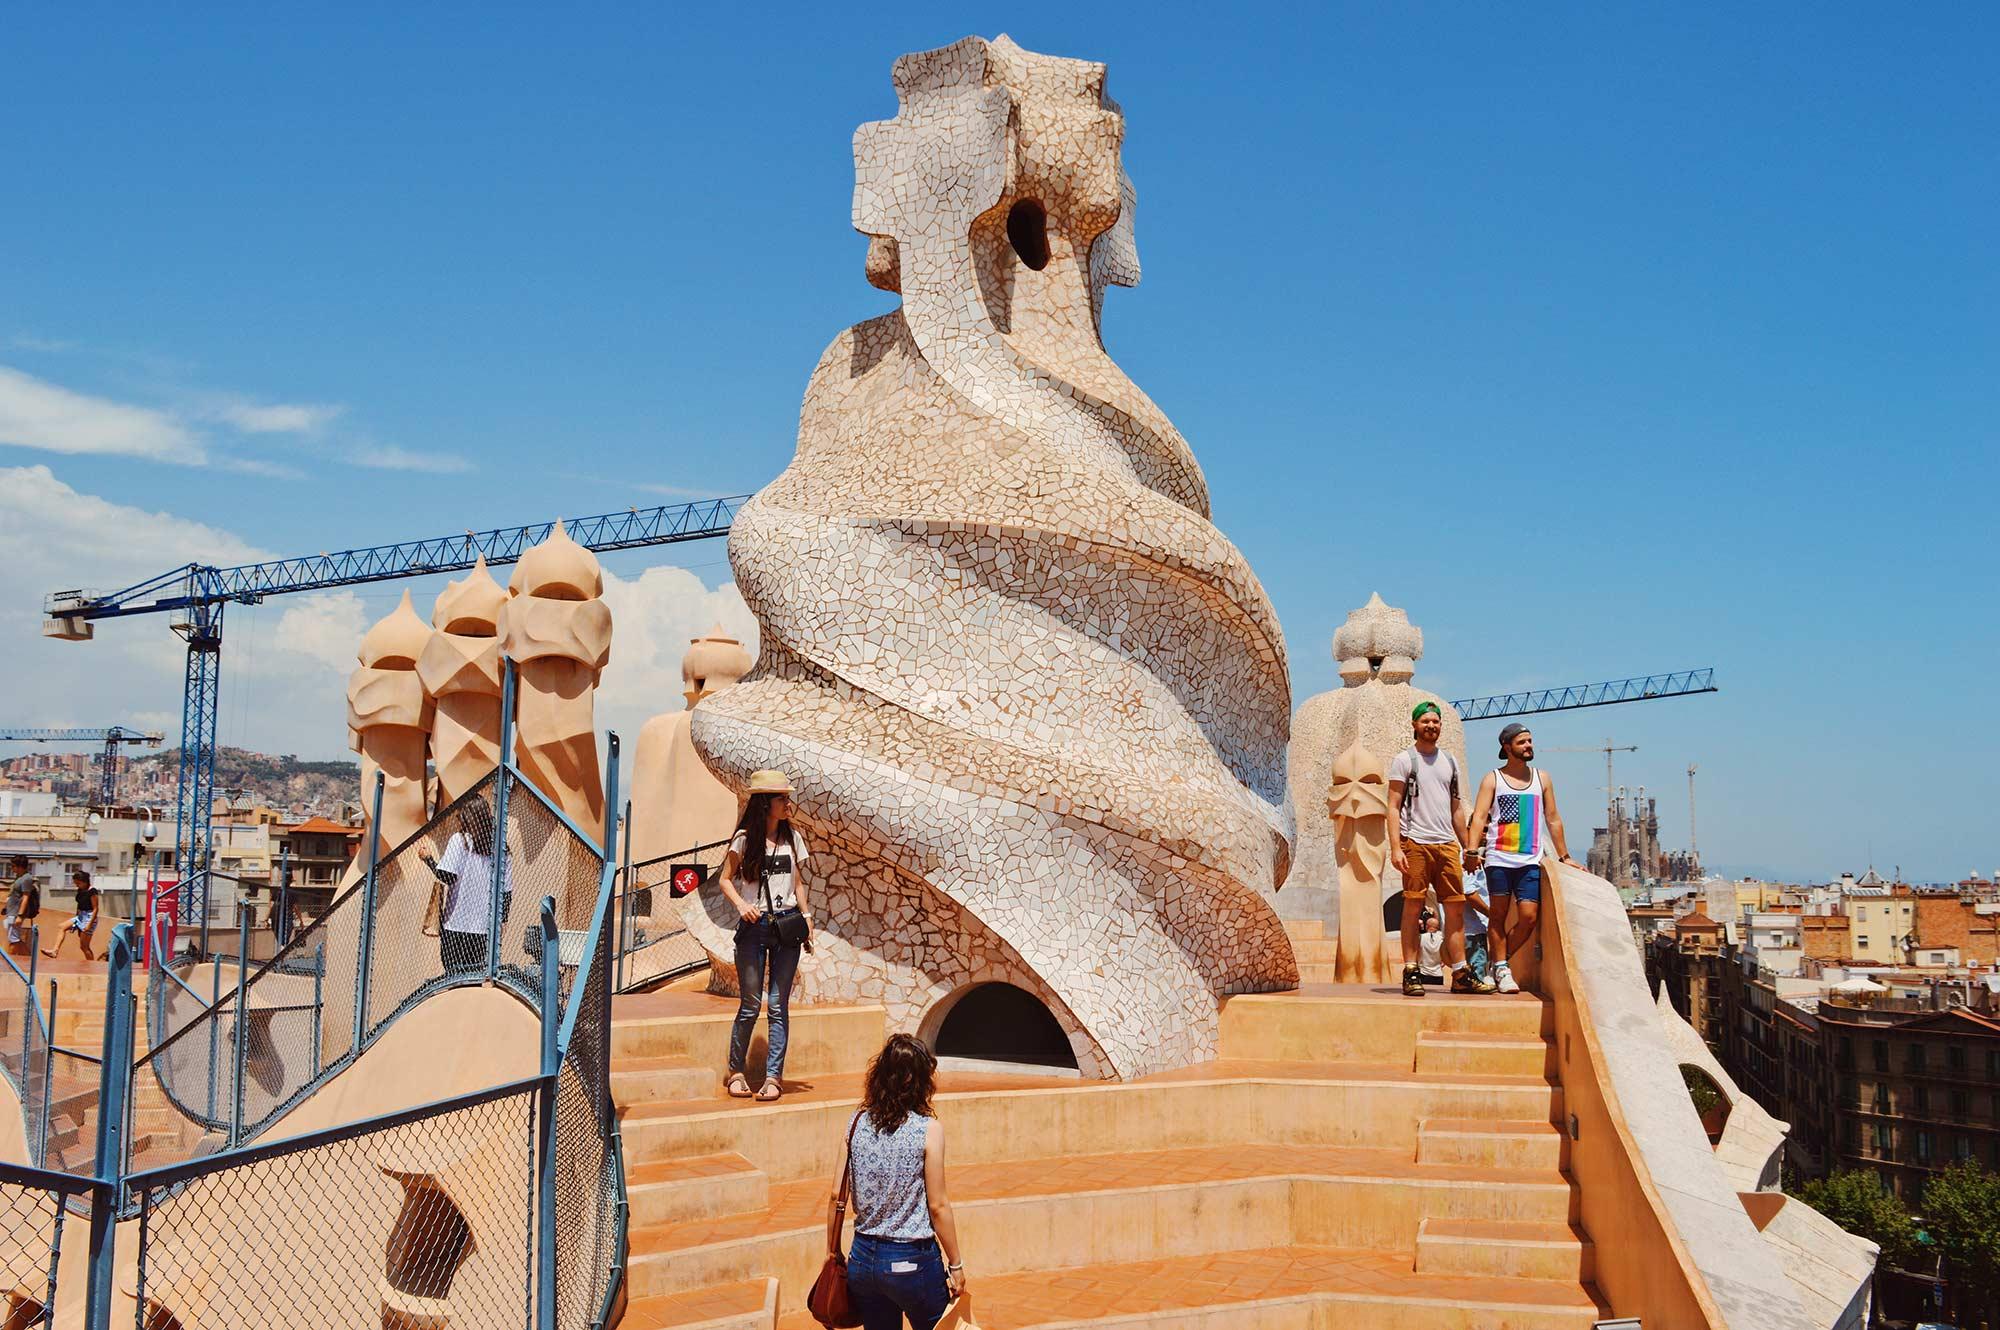 Gay Travel Guide Gaudi Architecture Casa Mila La Pedrera © CoupleofMen.com